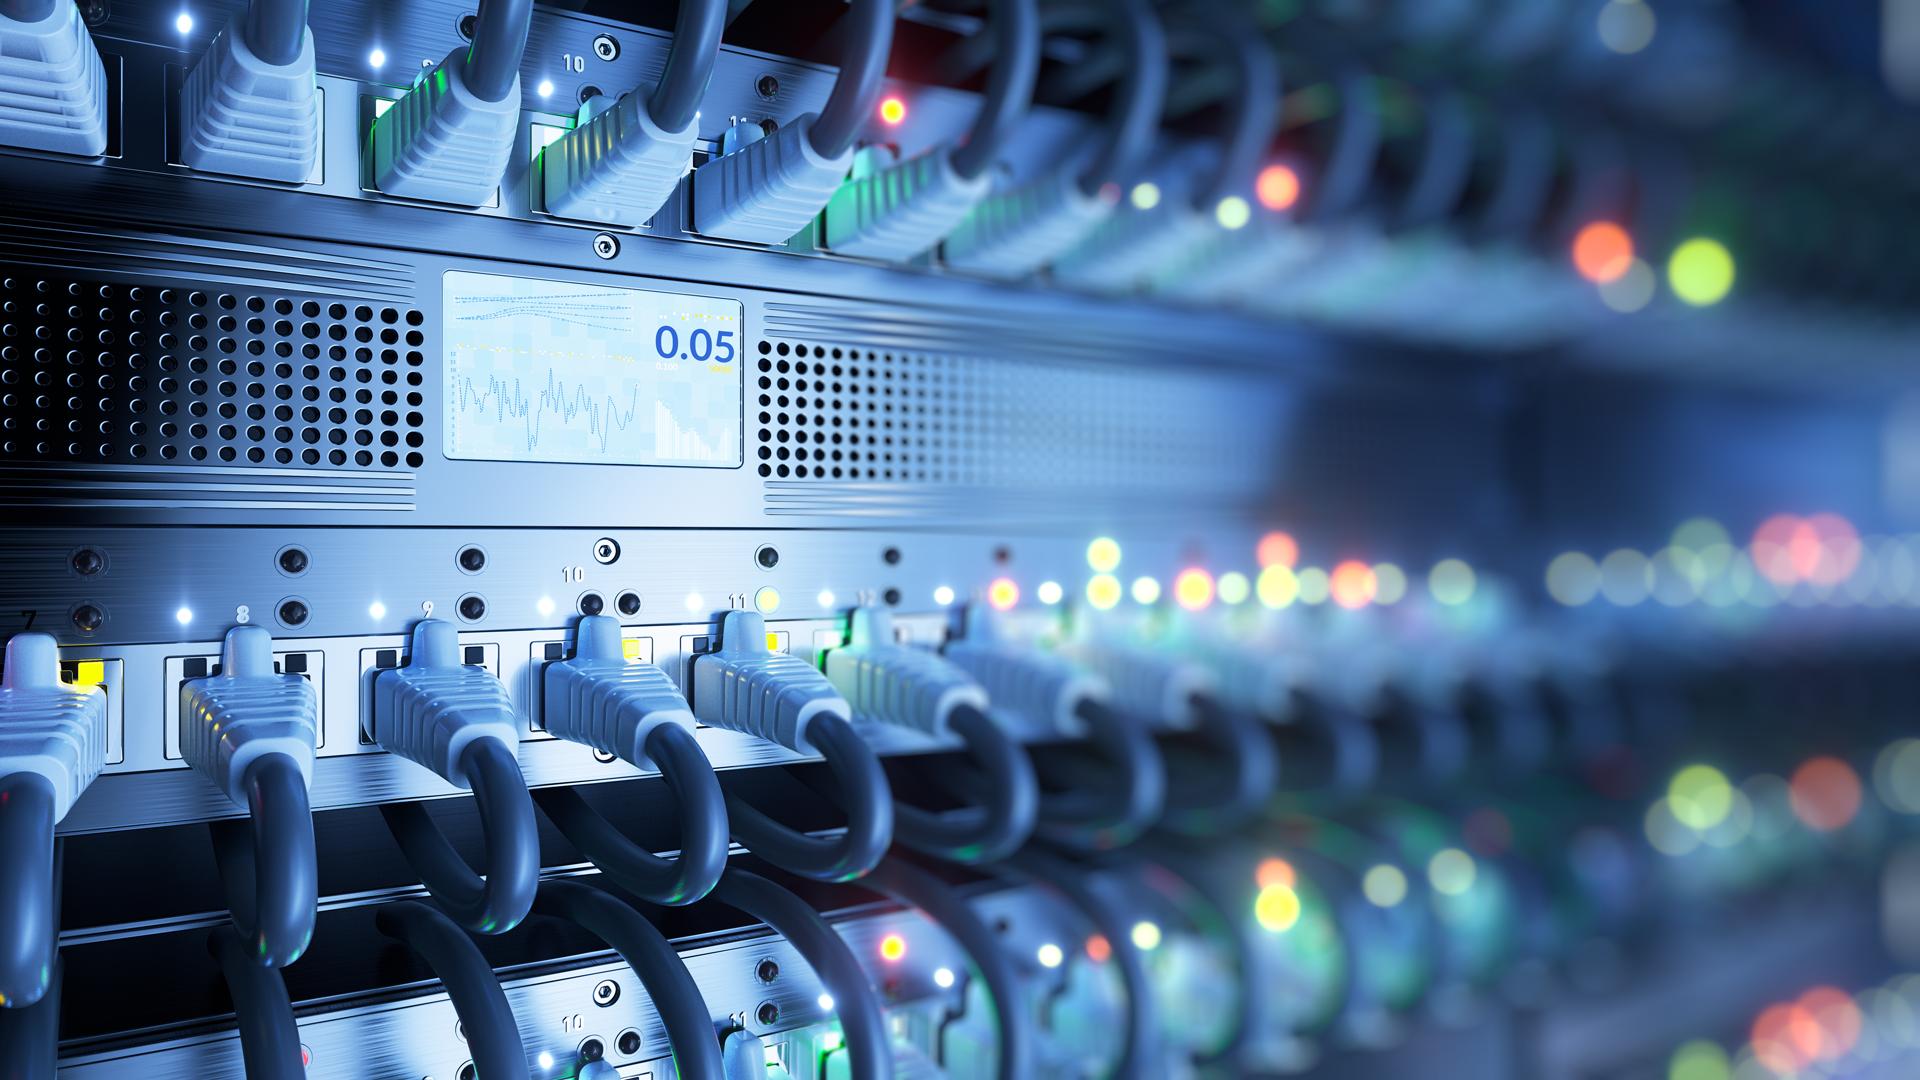 How to preserve network bandwidth with IIoT edge IPCs